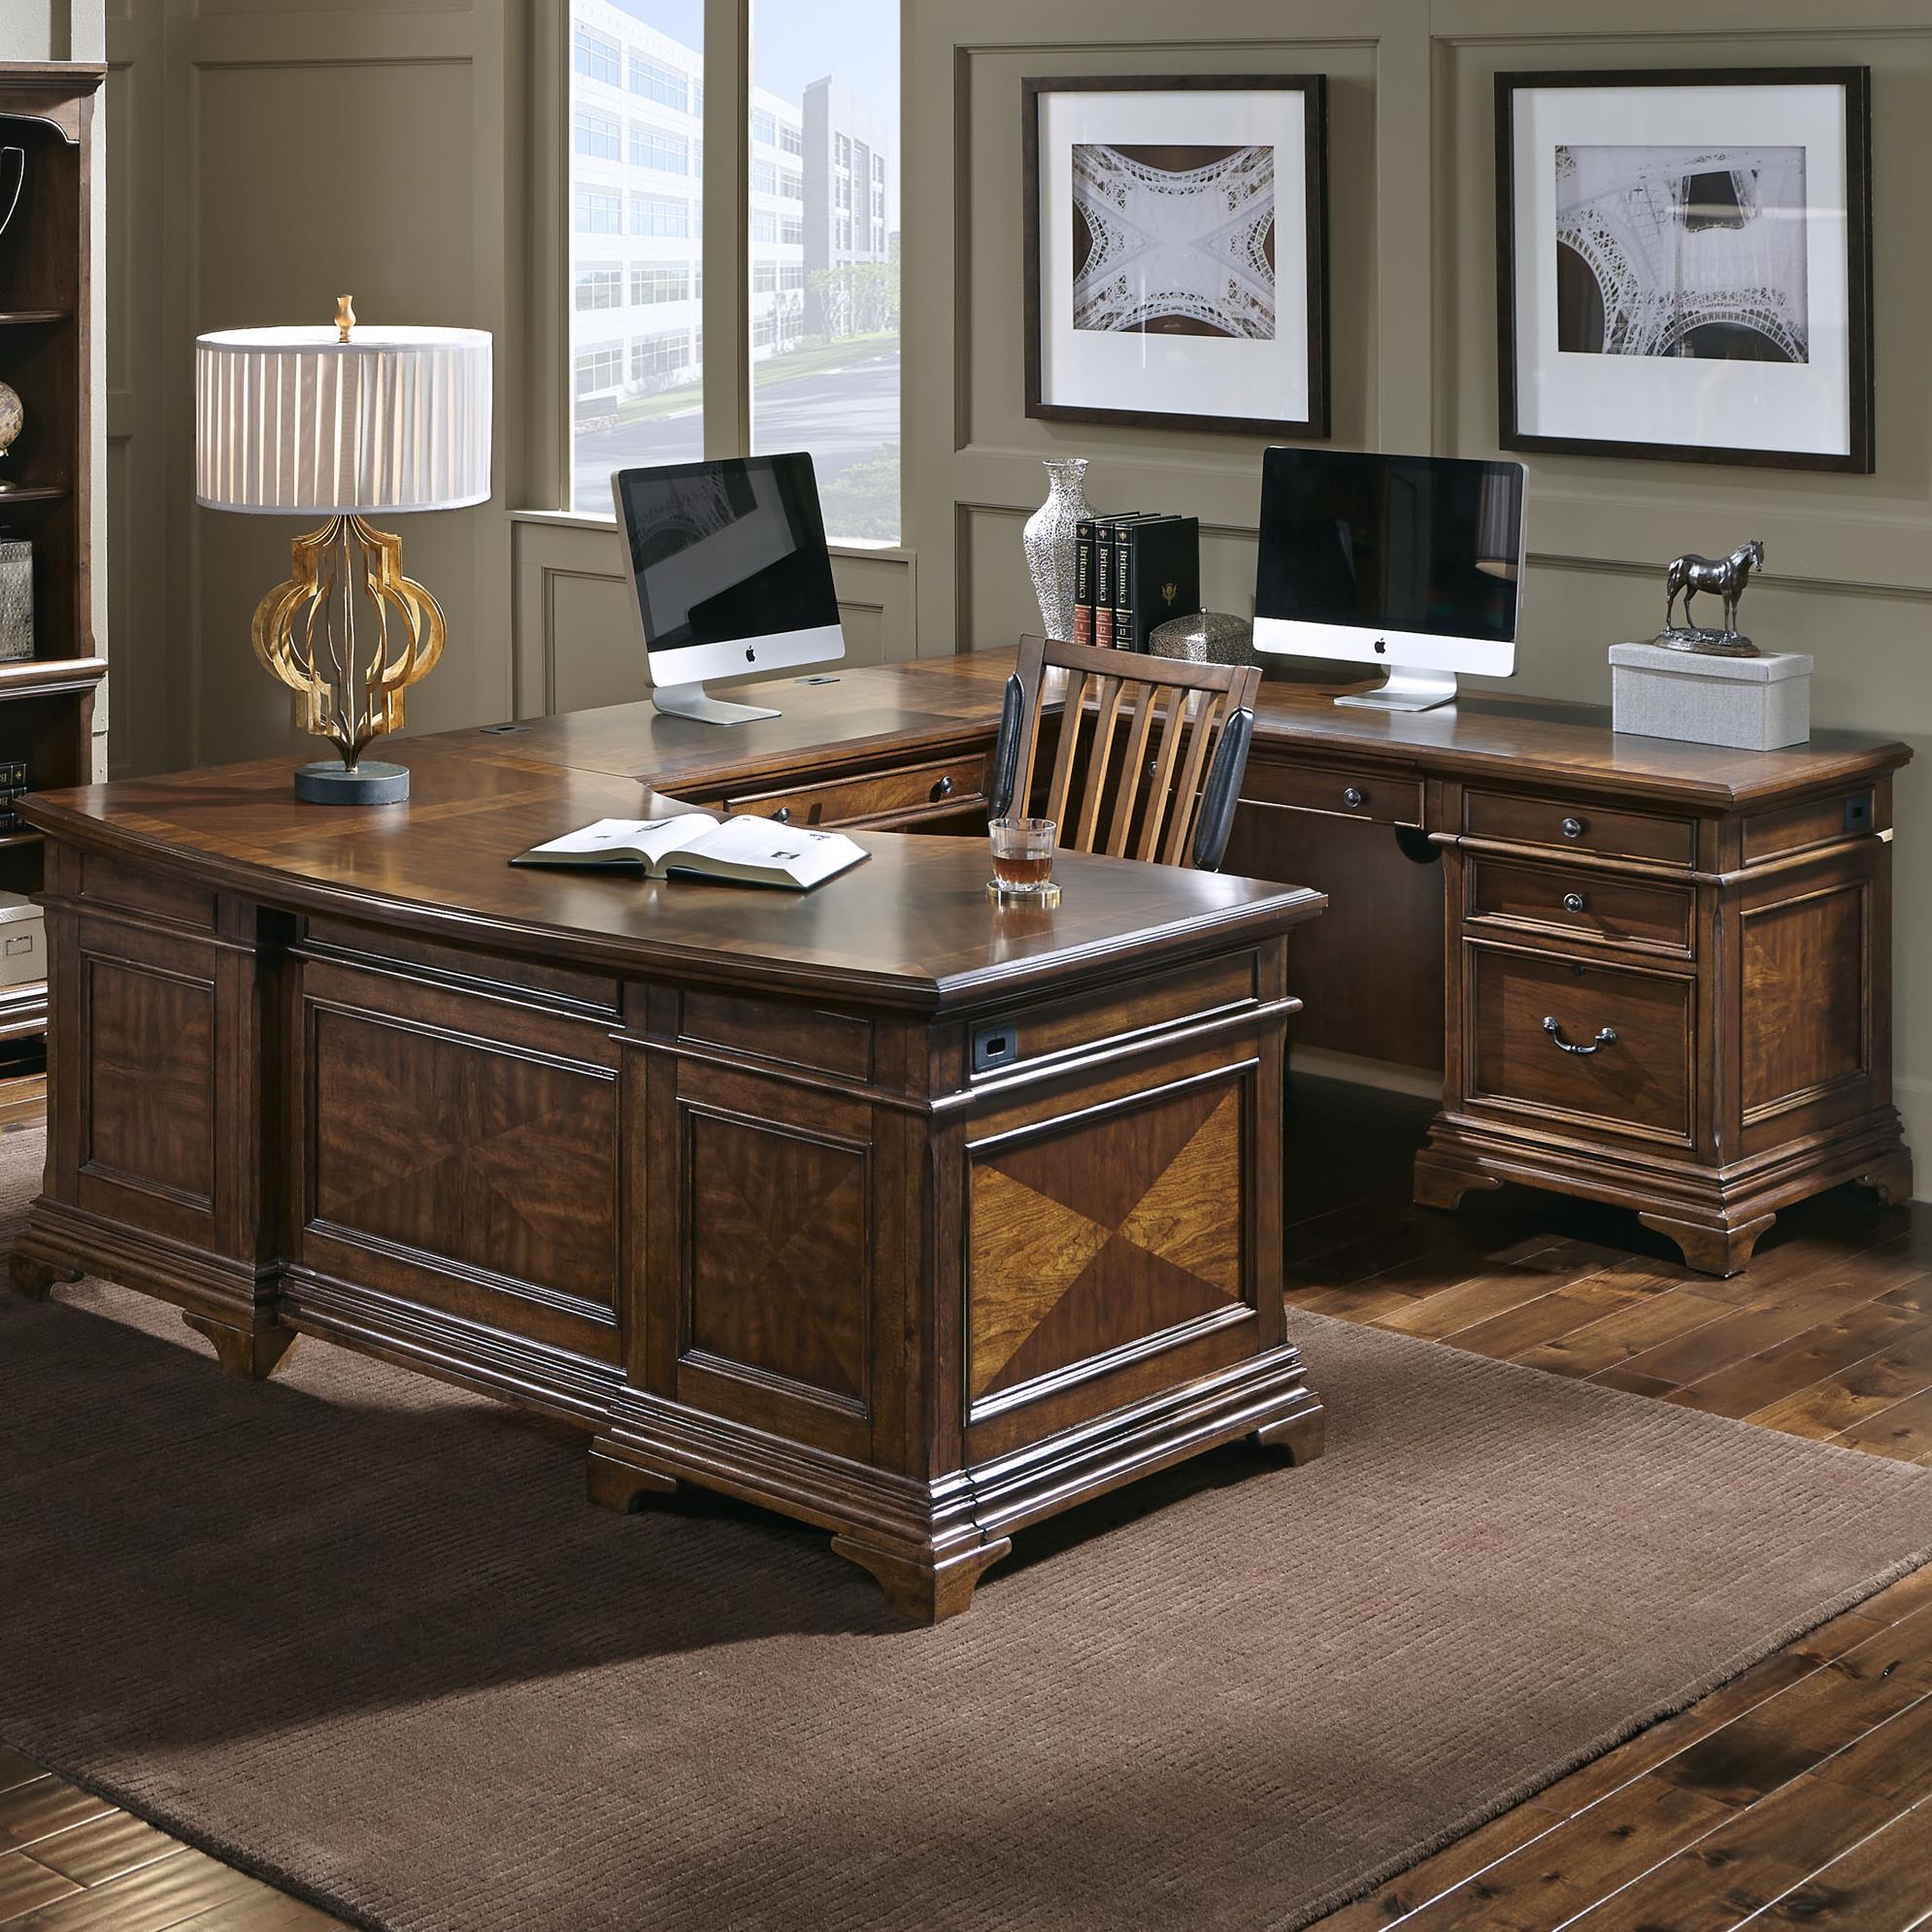 Aspenhome Hawthorne Right Facing Executive U Desk - Item Number: I26-305R+306+320R